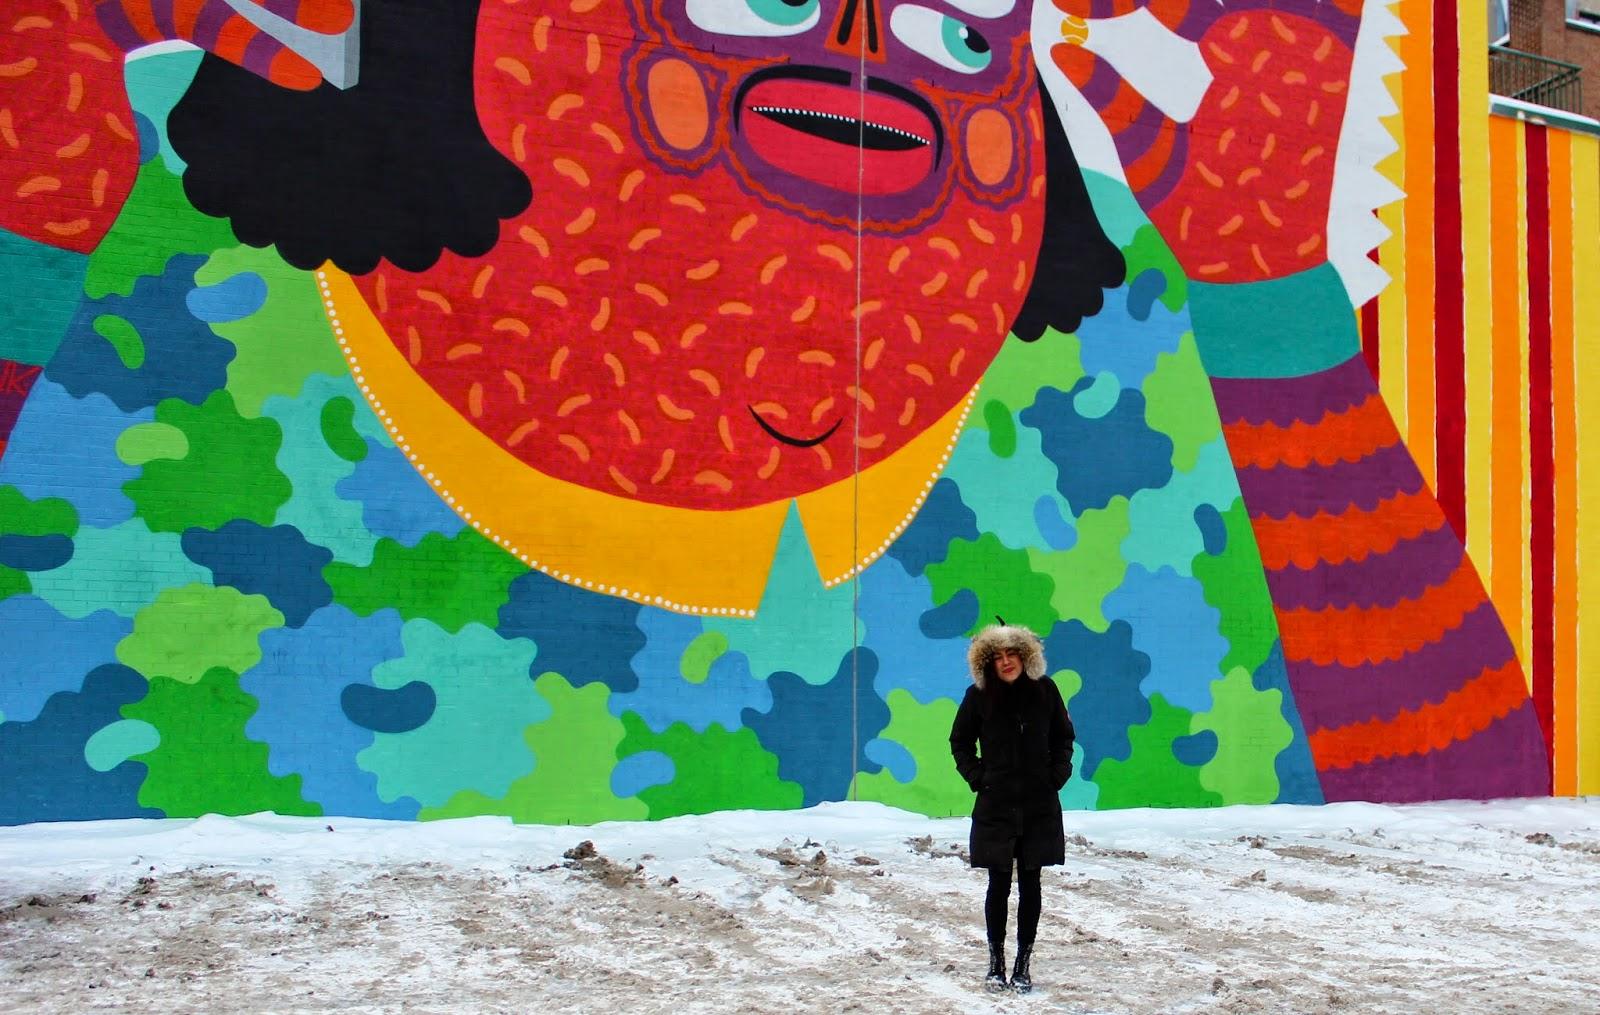 KASHINK street art mural festival fashion blog st laurent nightlife montreal bars canada goose fashion style